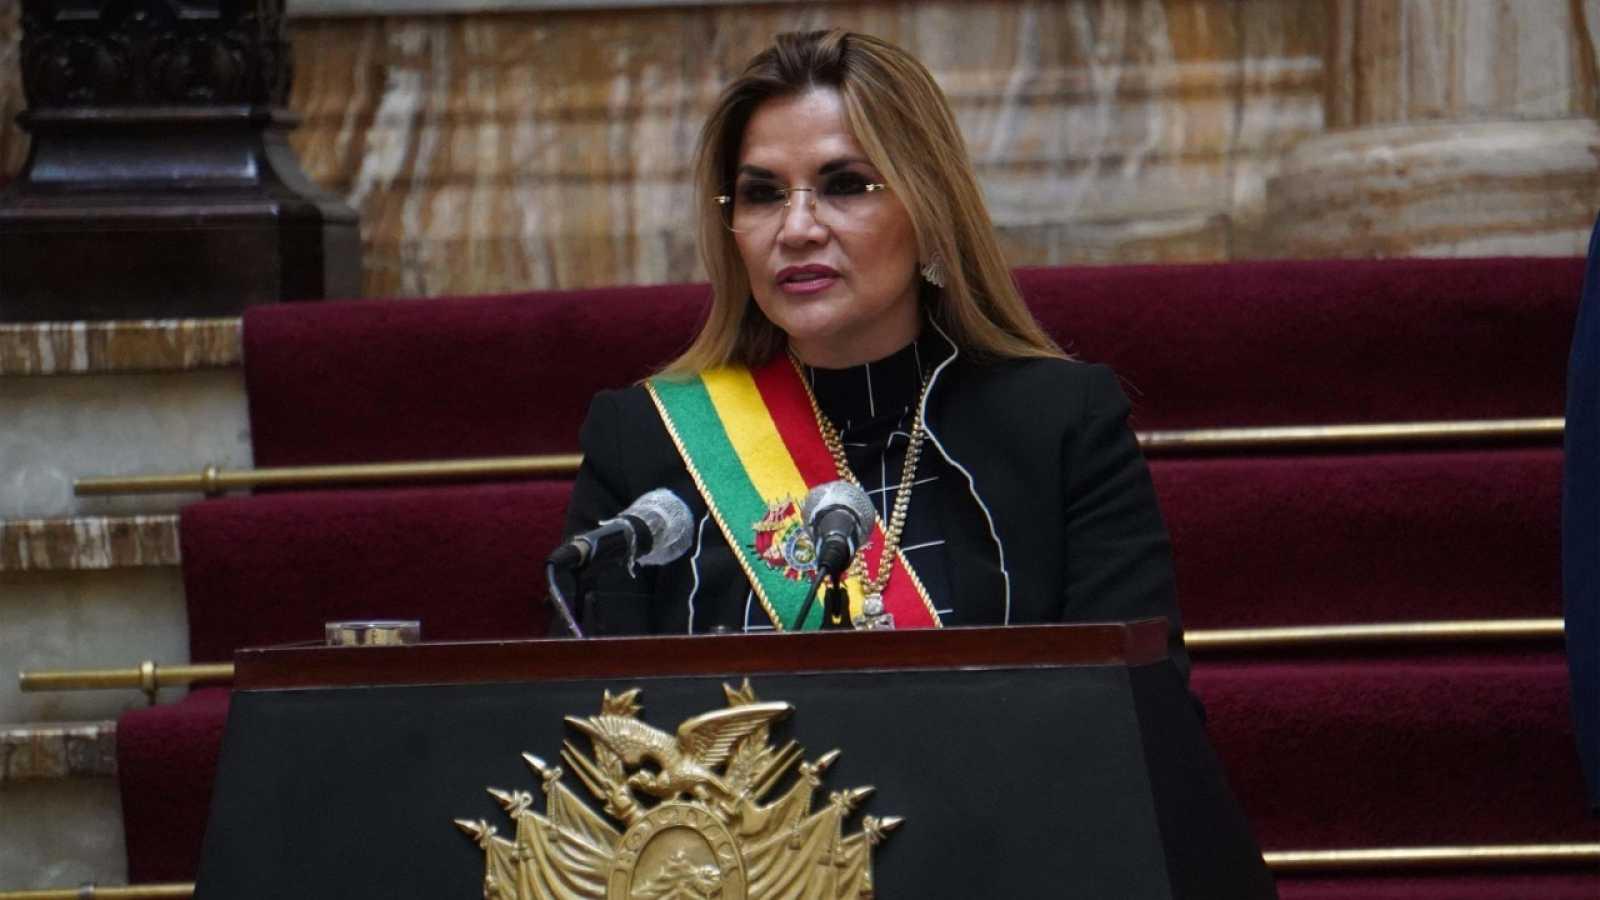 La presidenta interina de Bolivia, Jeanine Áñez, se retira de la carrera  electoral - RTVE.es